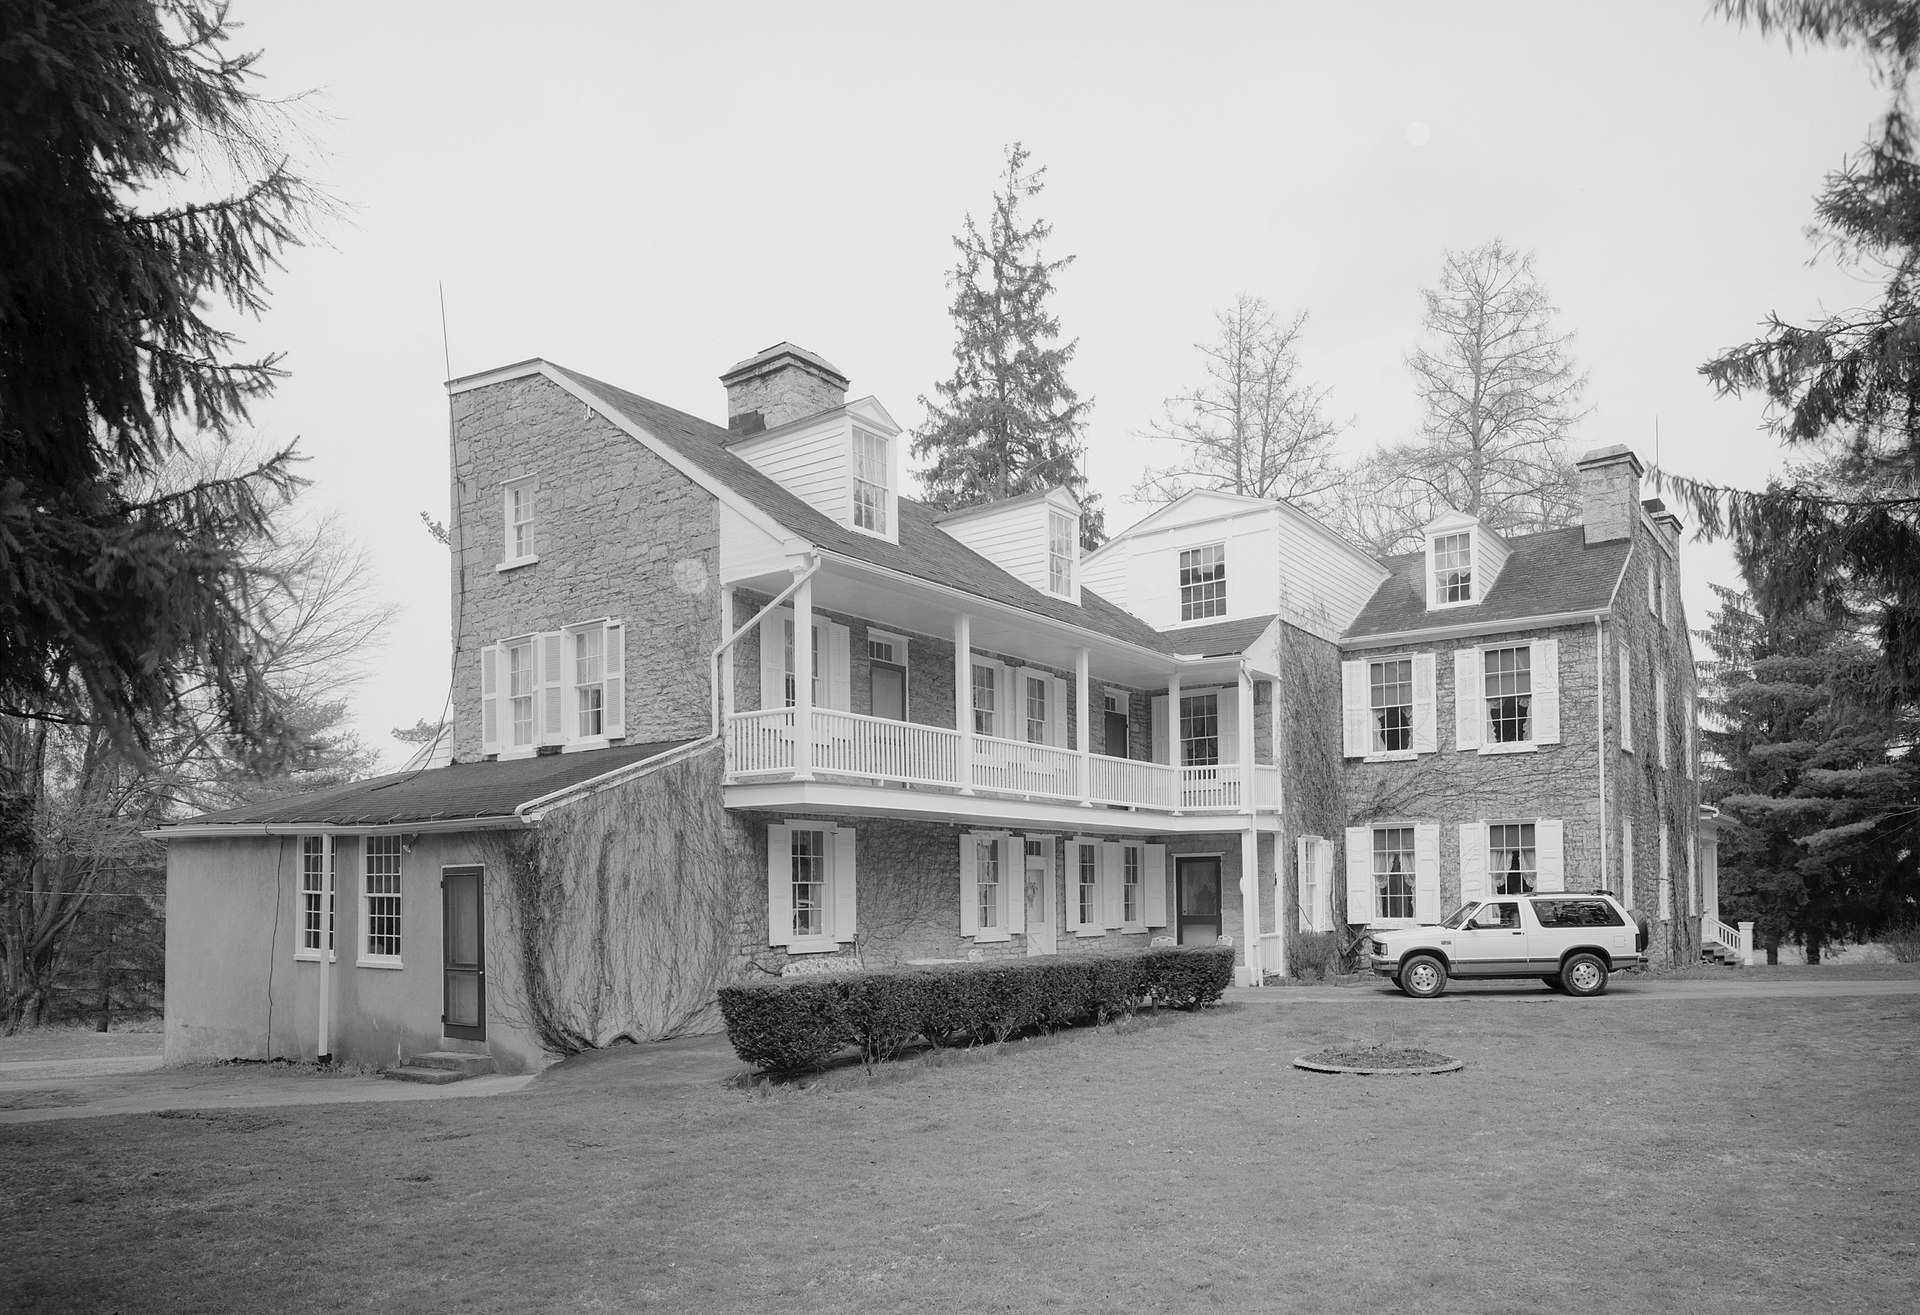 Pennsylvania Furnace Mansion